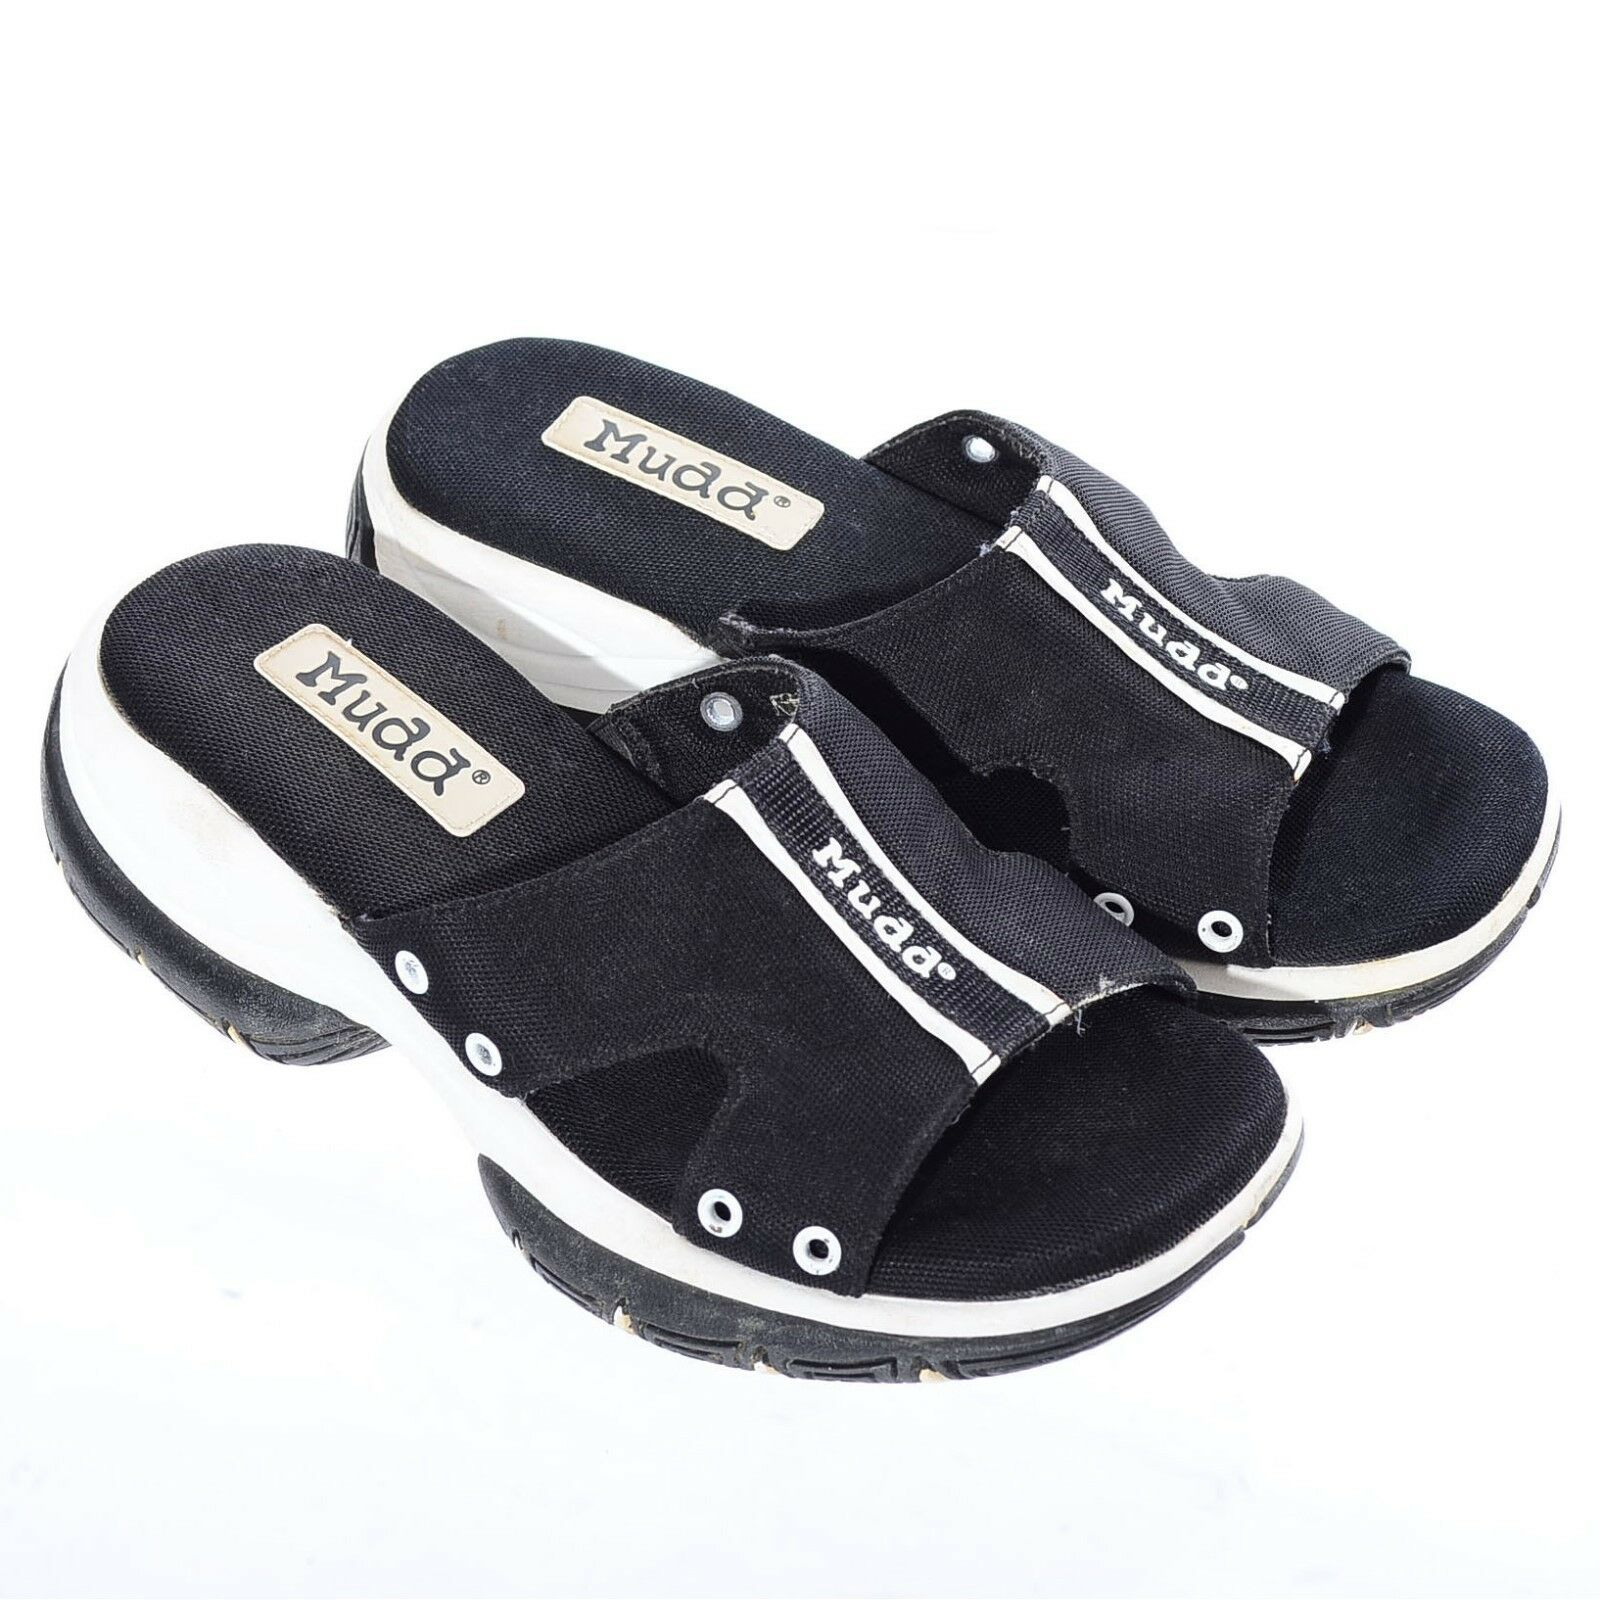 Vtg 90s SPORTY SPORTY SPORTY Y2K Club-Kid Platform Chunky Lug Soles Sandals Slip-On shoes 7 749fa2